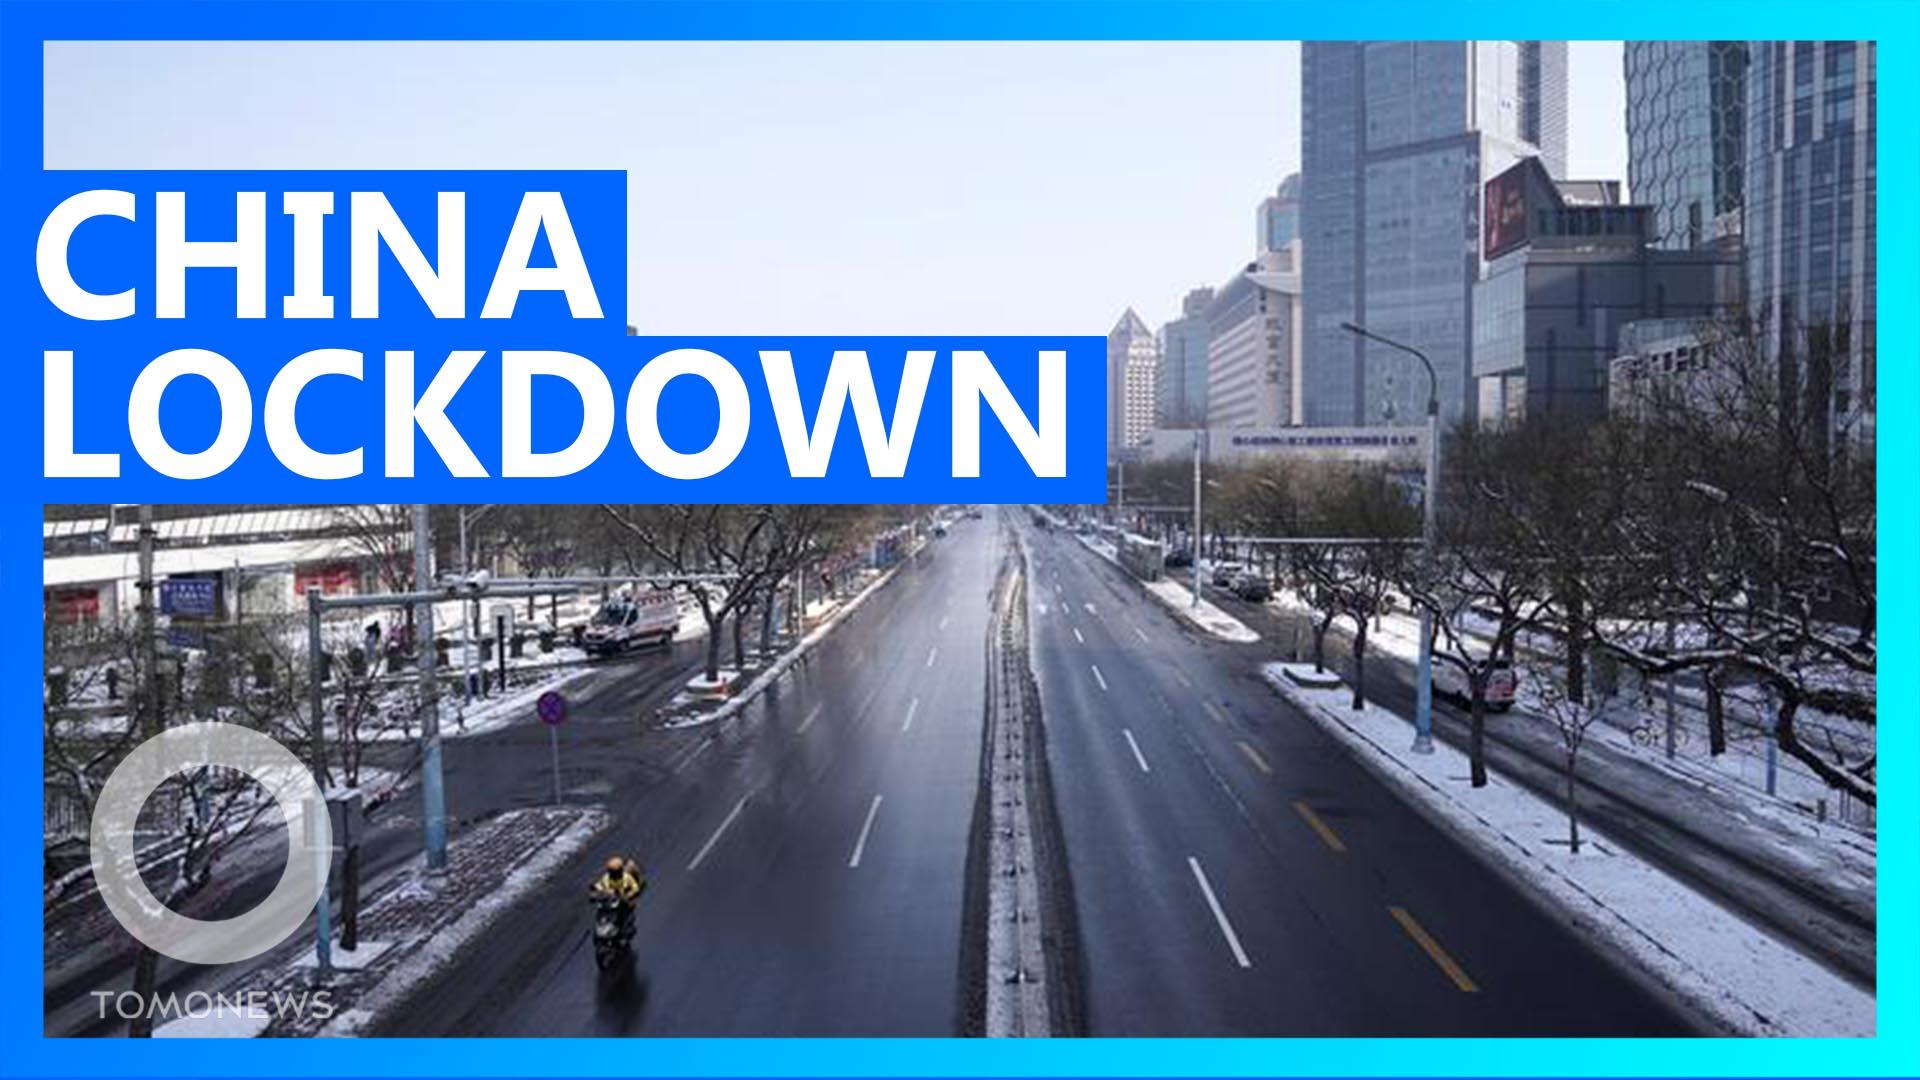 China goes into further lockdown as Wuhan coronavirus spreads